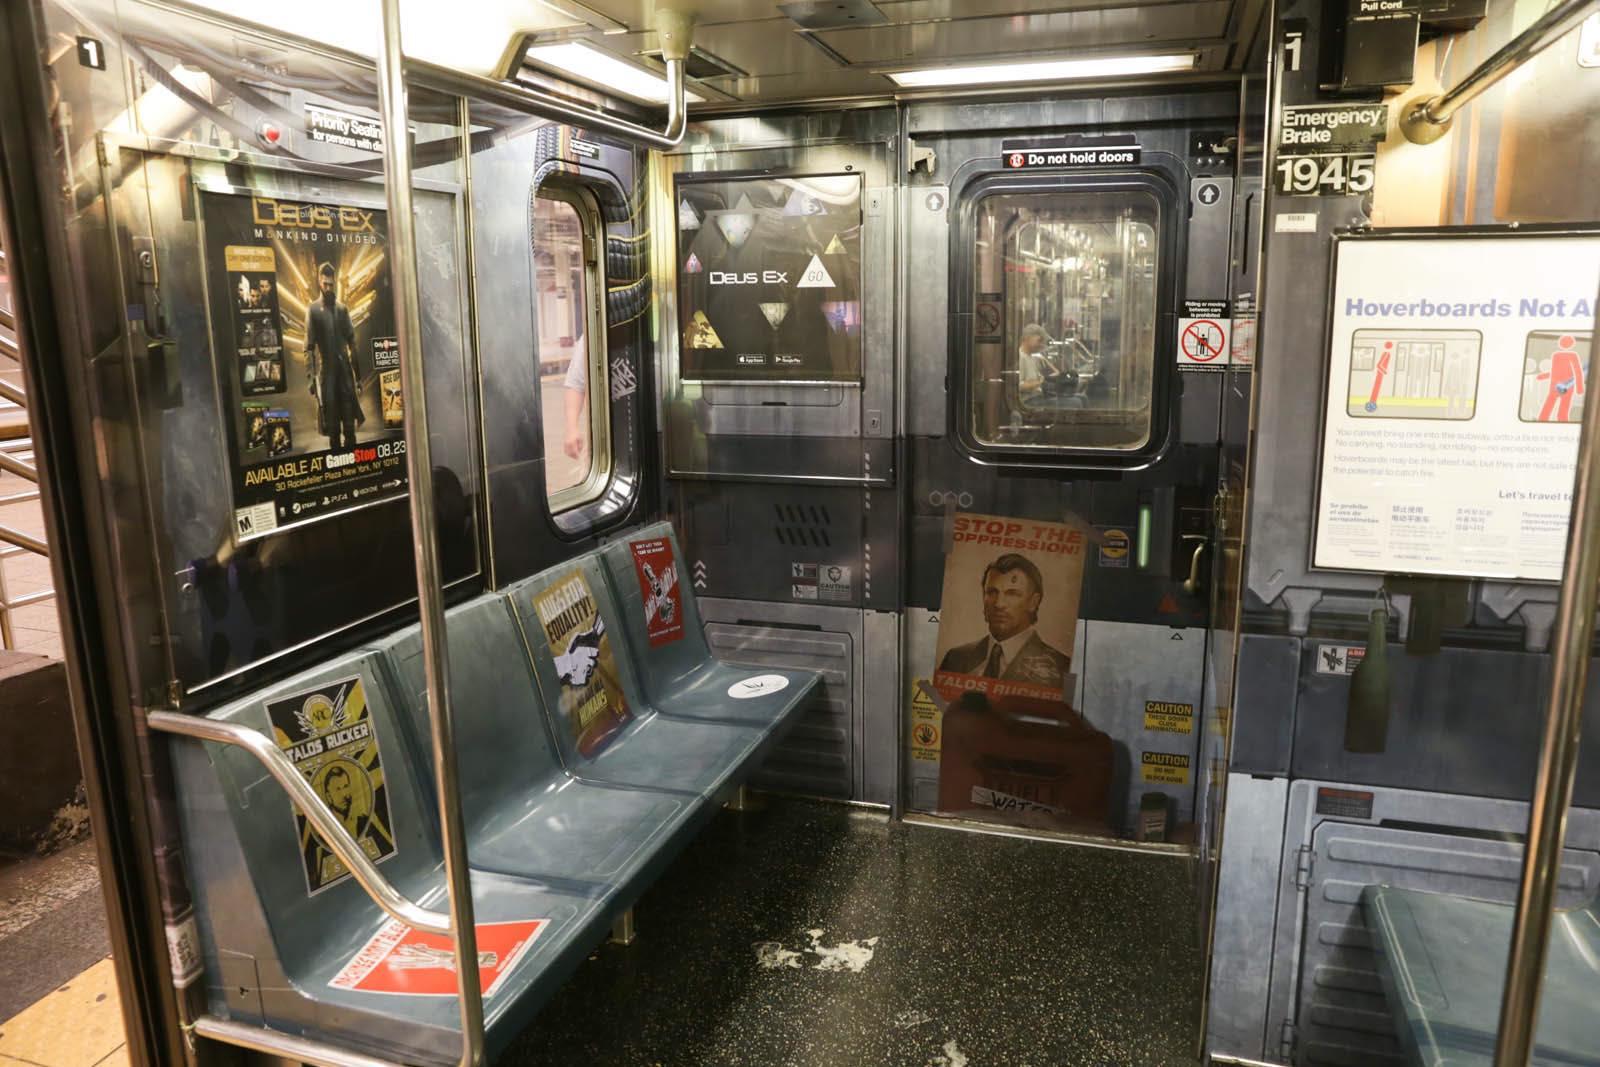 New Yorkem se prohání vlak metra s motivy Deus Ex: Mankind Divided 128577